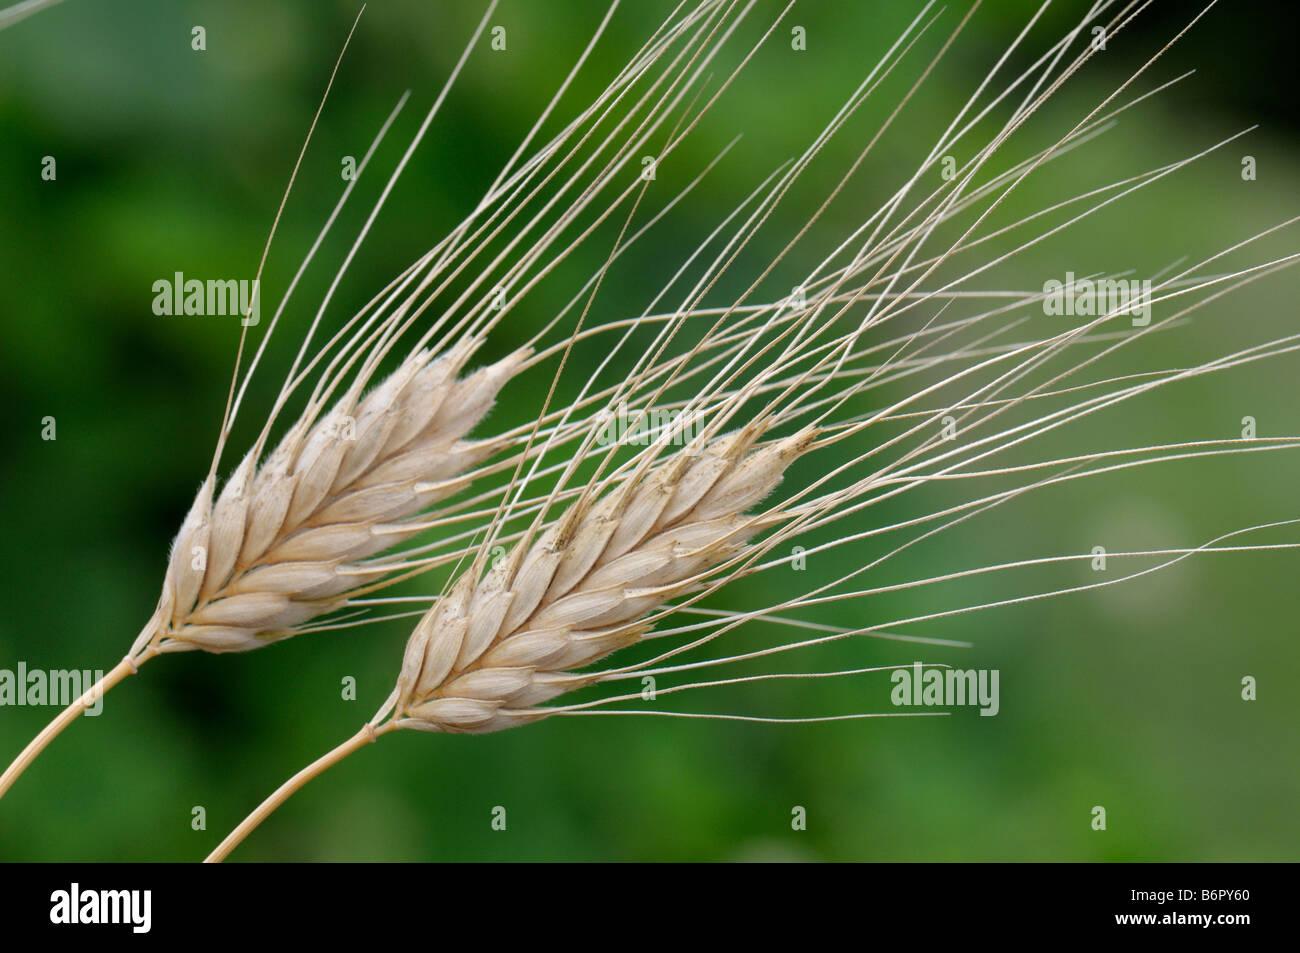 Timopheevs Wheat (Triticum timopheevii), ears Stock Photo